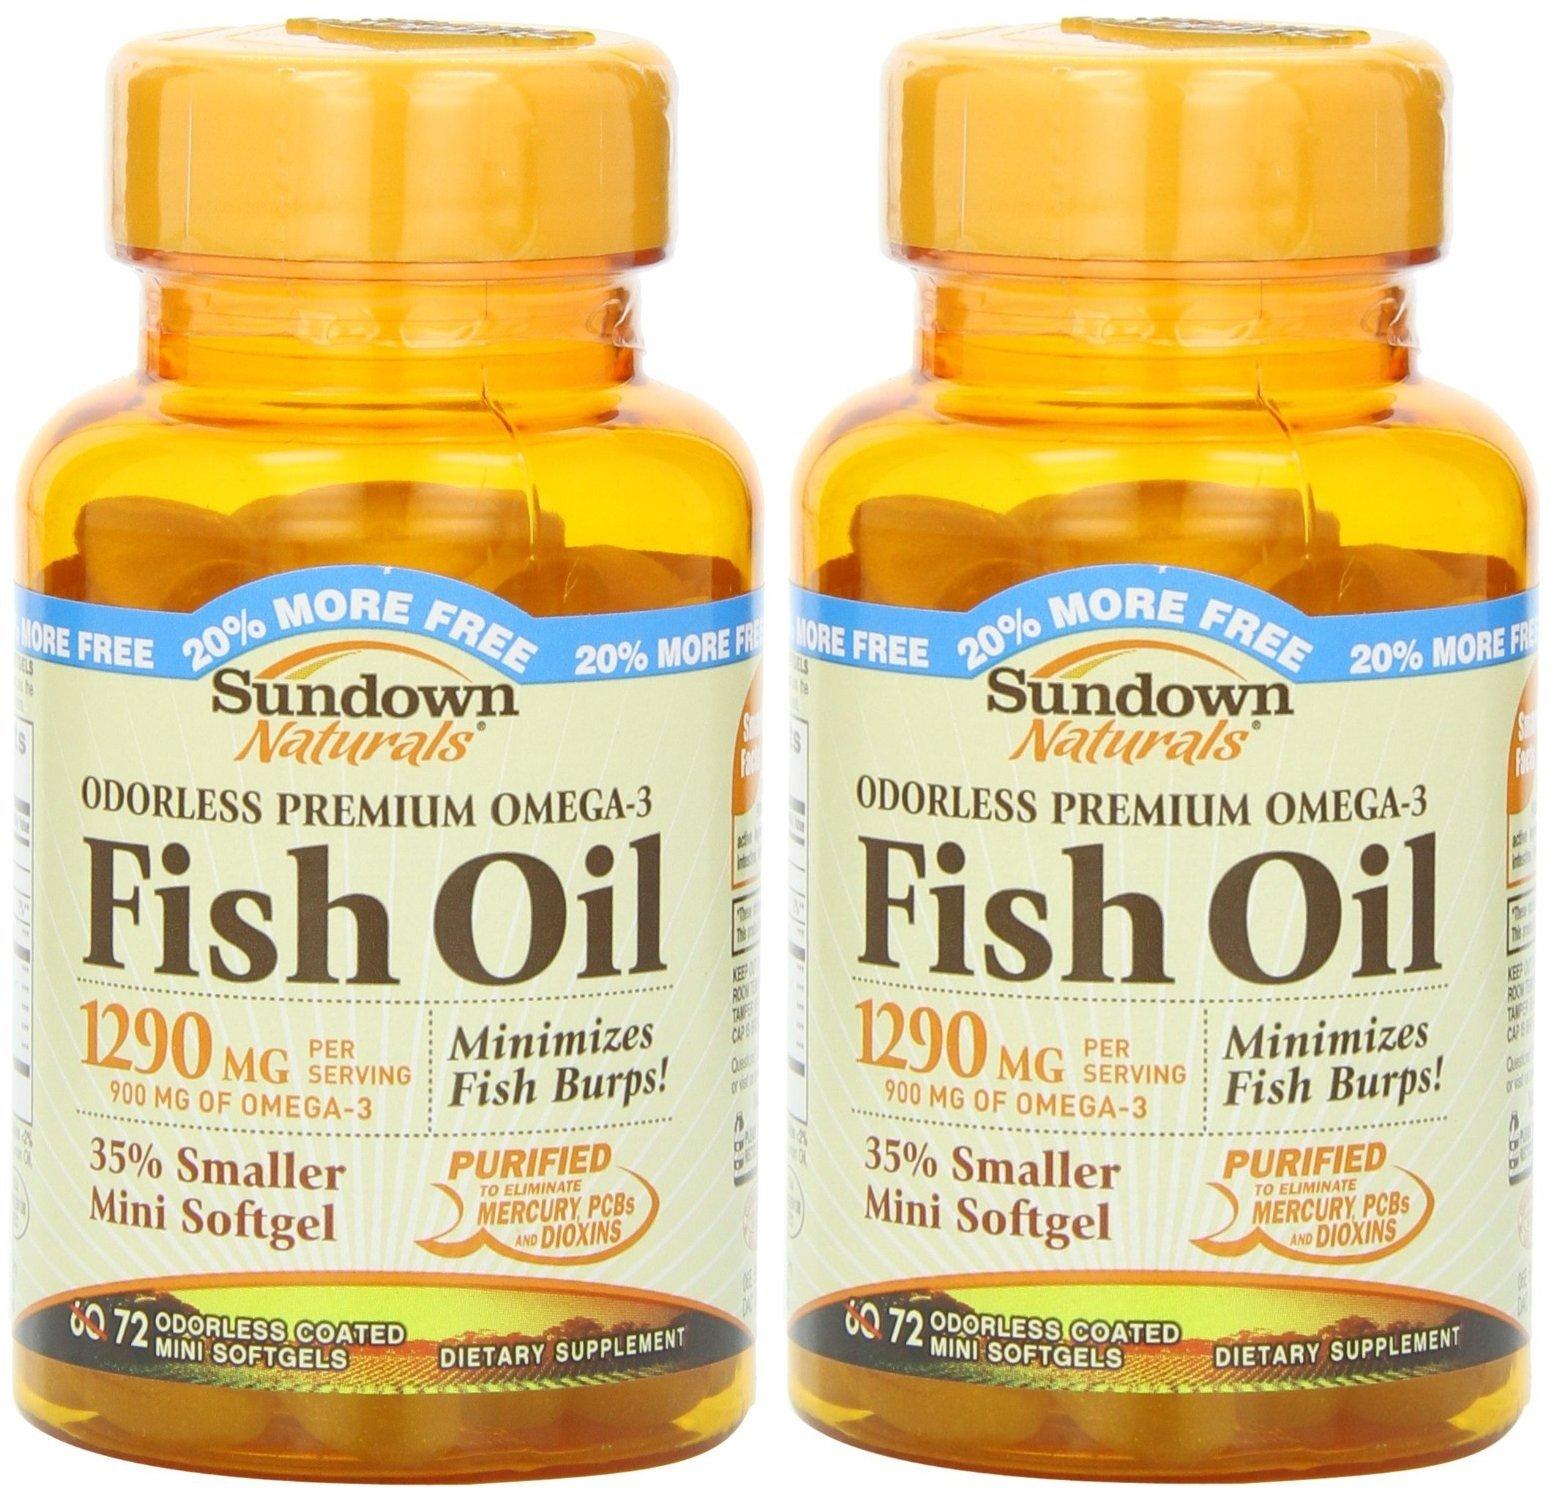 Sundown Naturals Naturals Odorless Premium Omega-3 Fish Oil, 72 Softgels (Pack of 2) Total 144